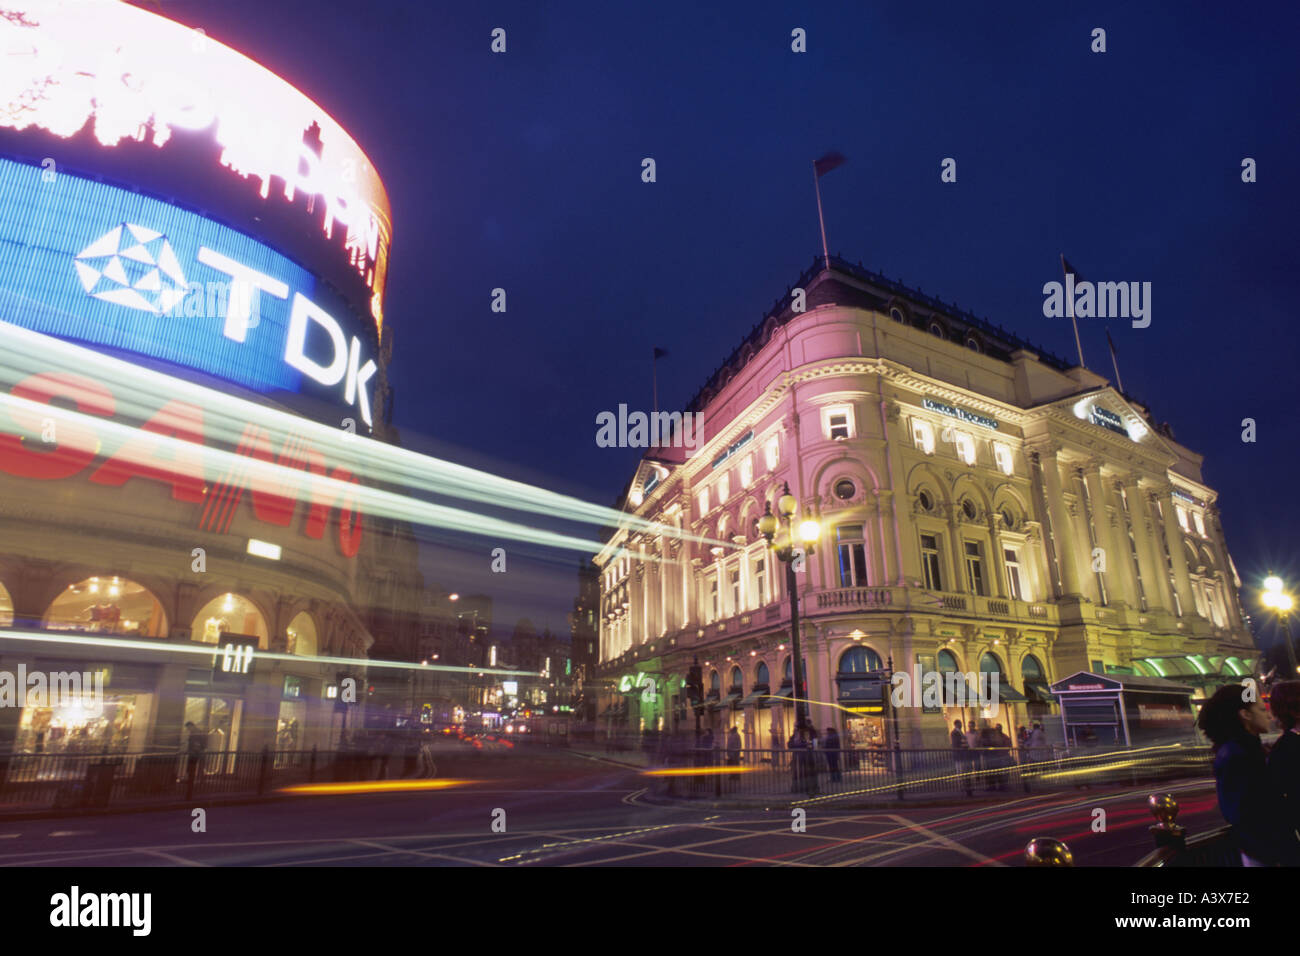 UK England London Picadilly Circus - Stock Image